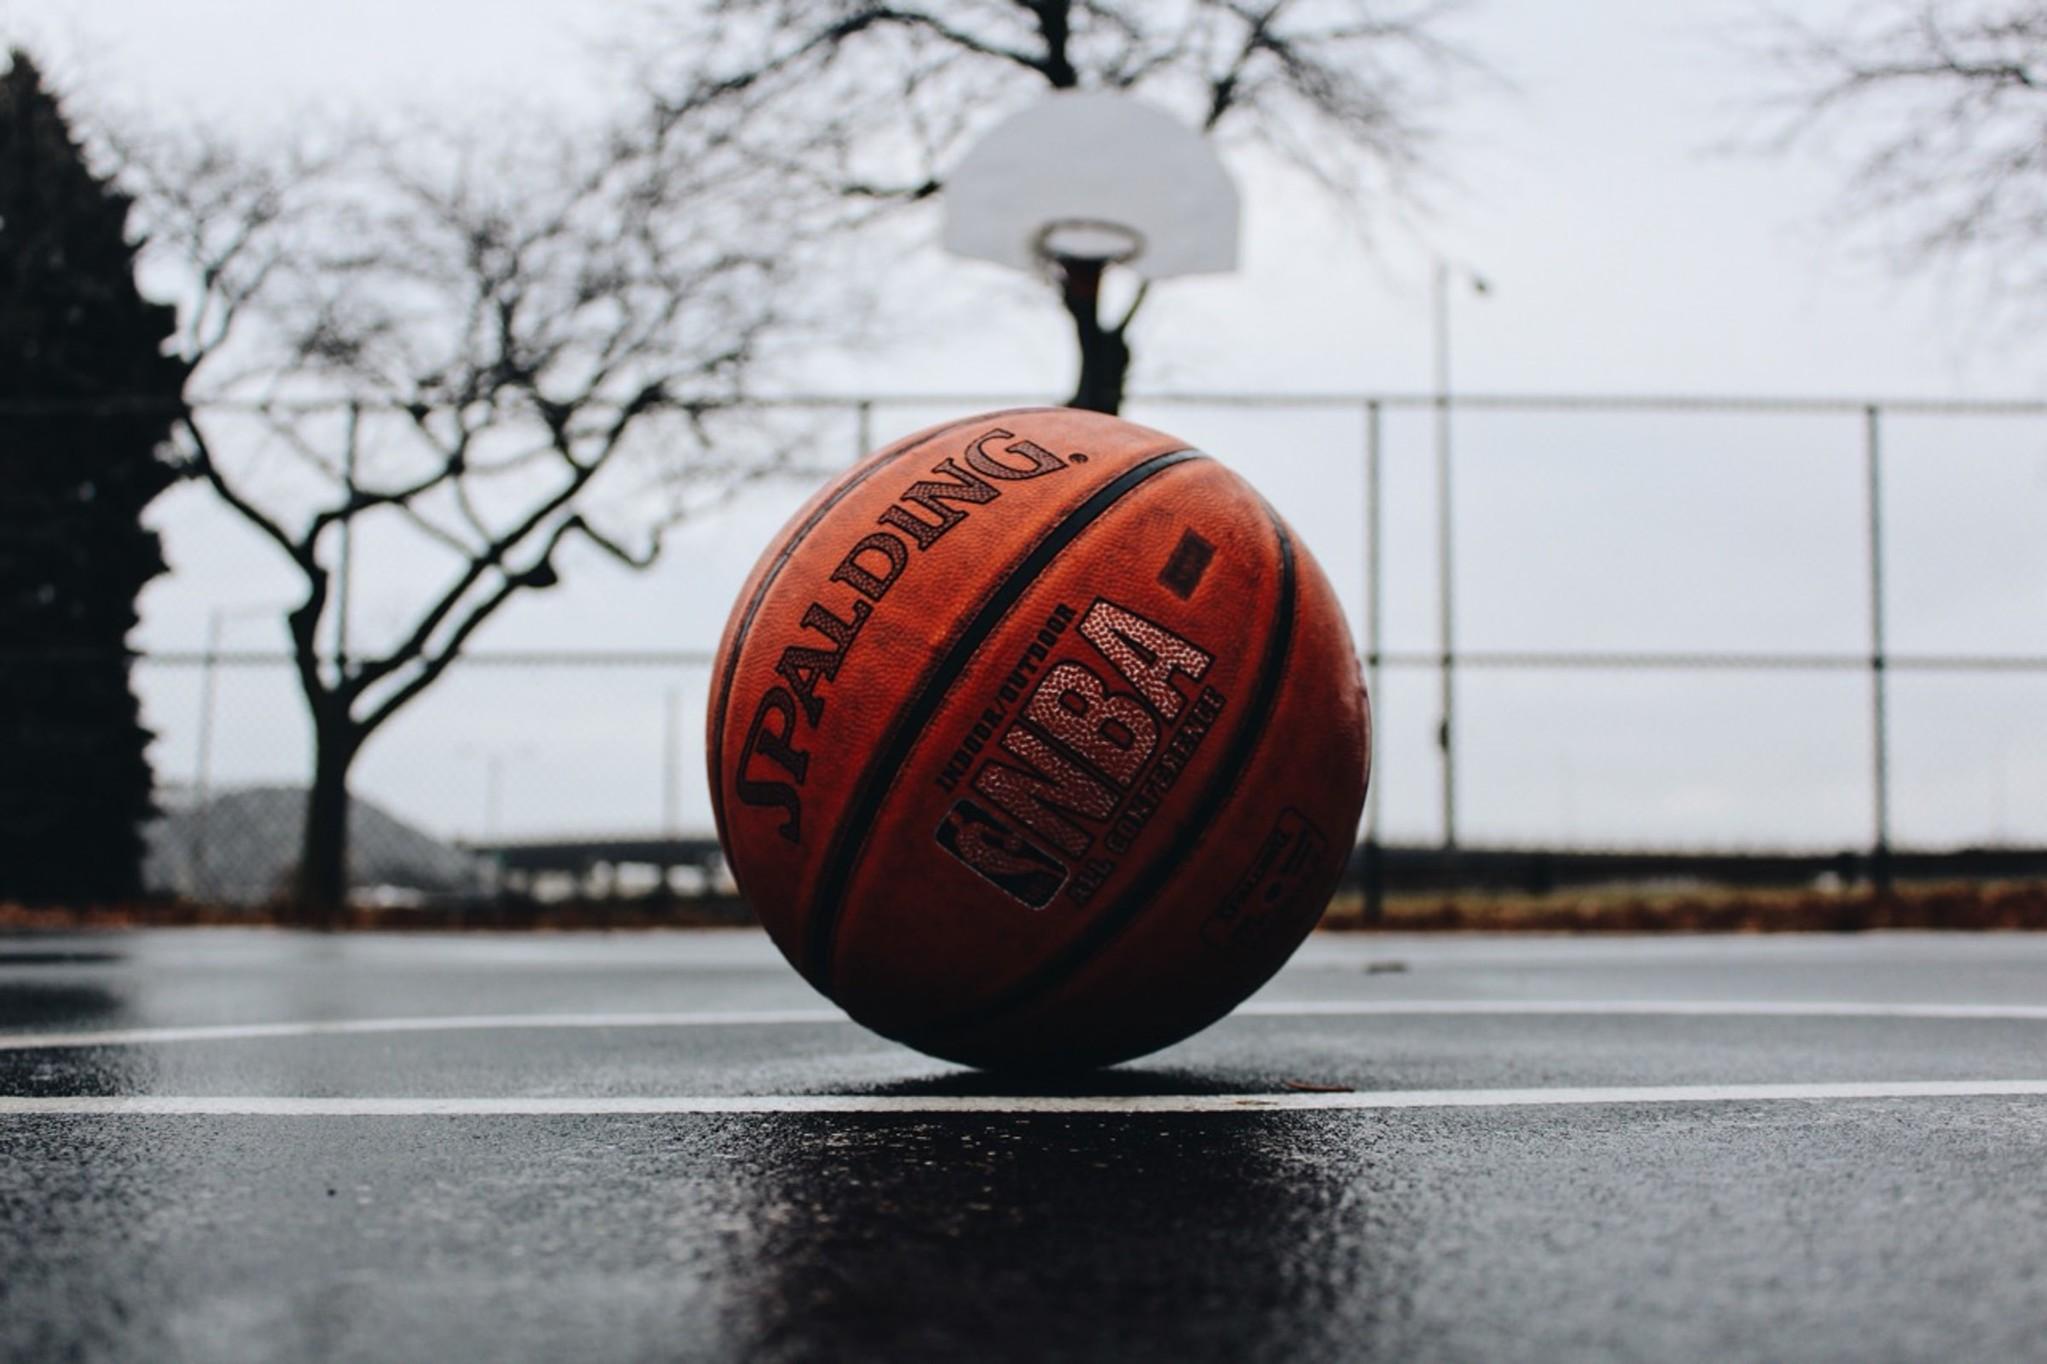 wilson-spalding-nba-basketballen